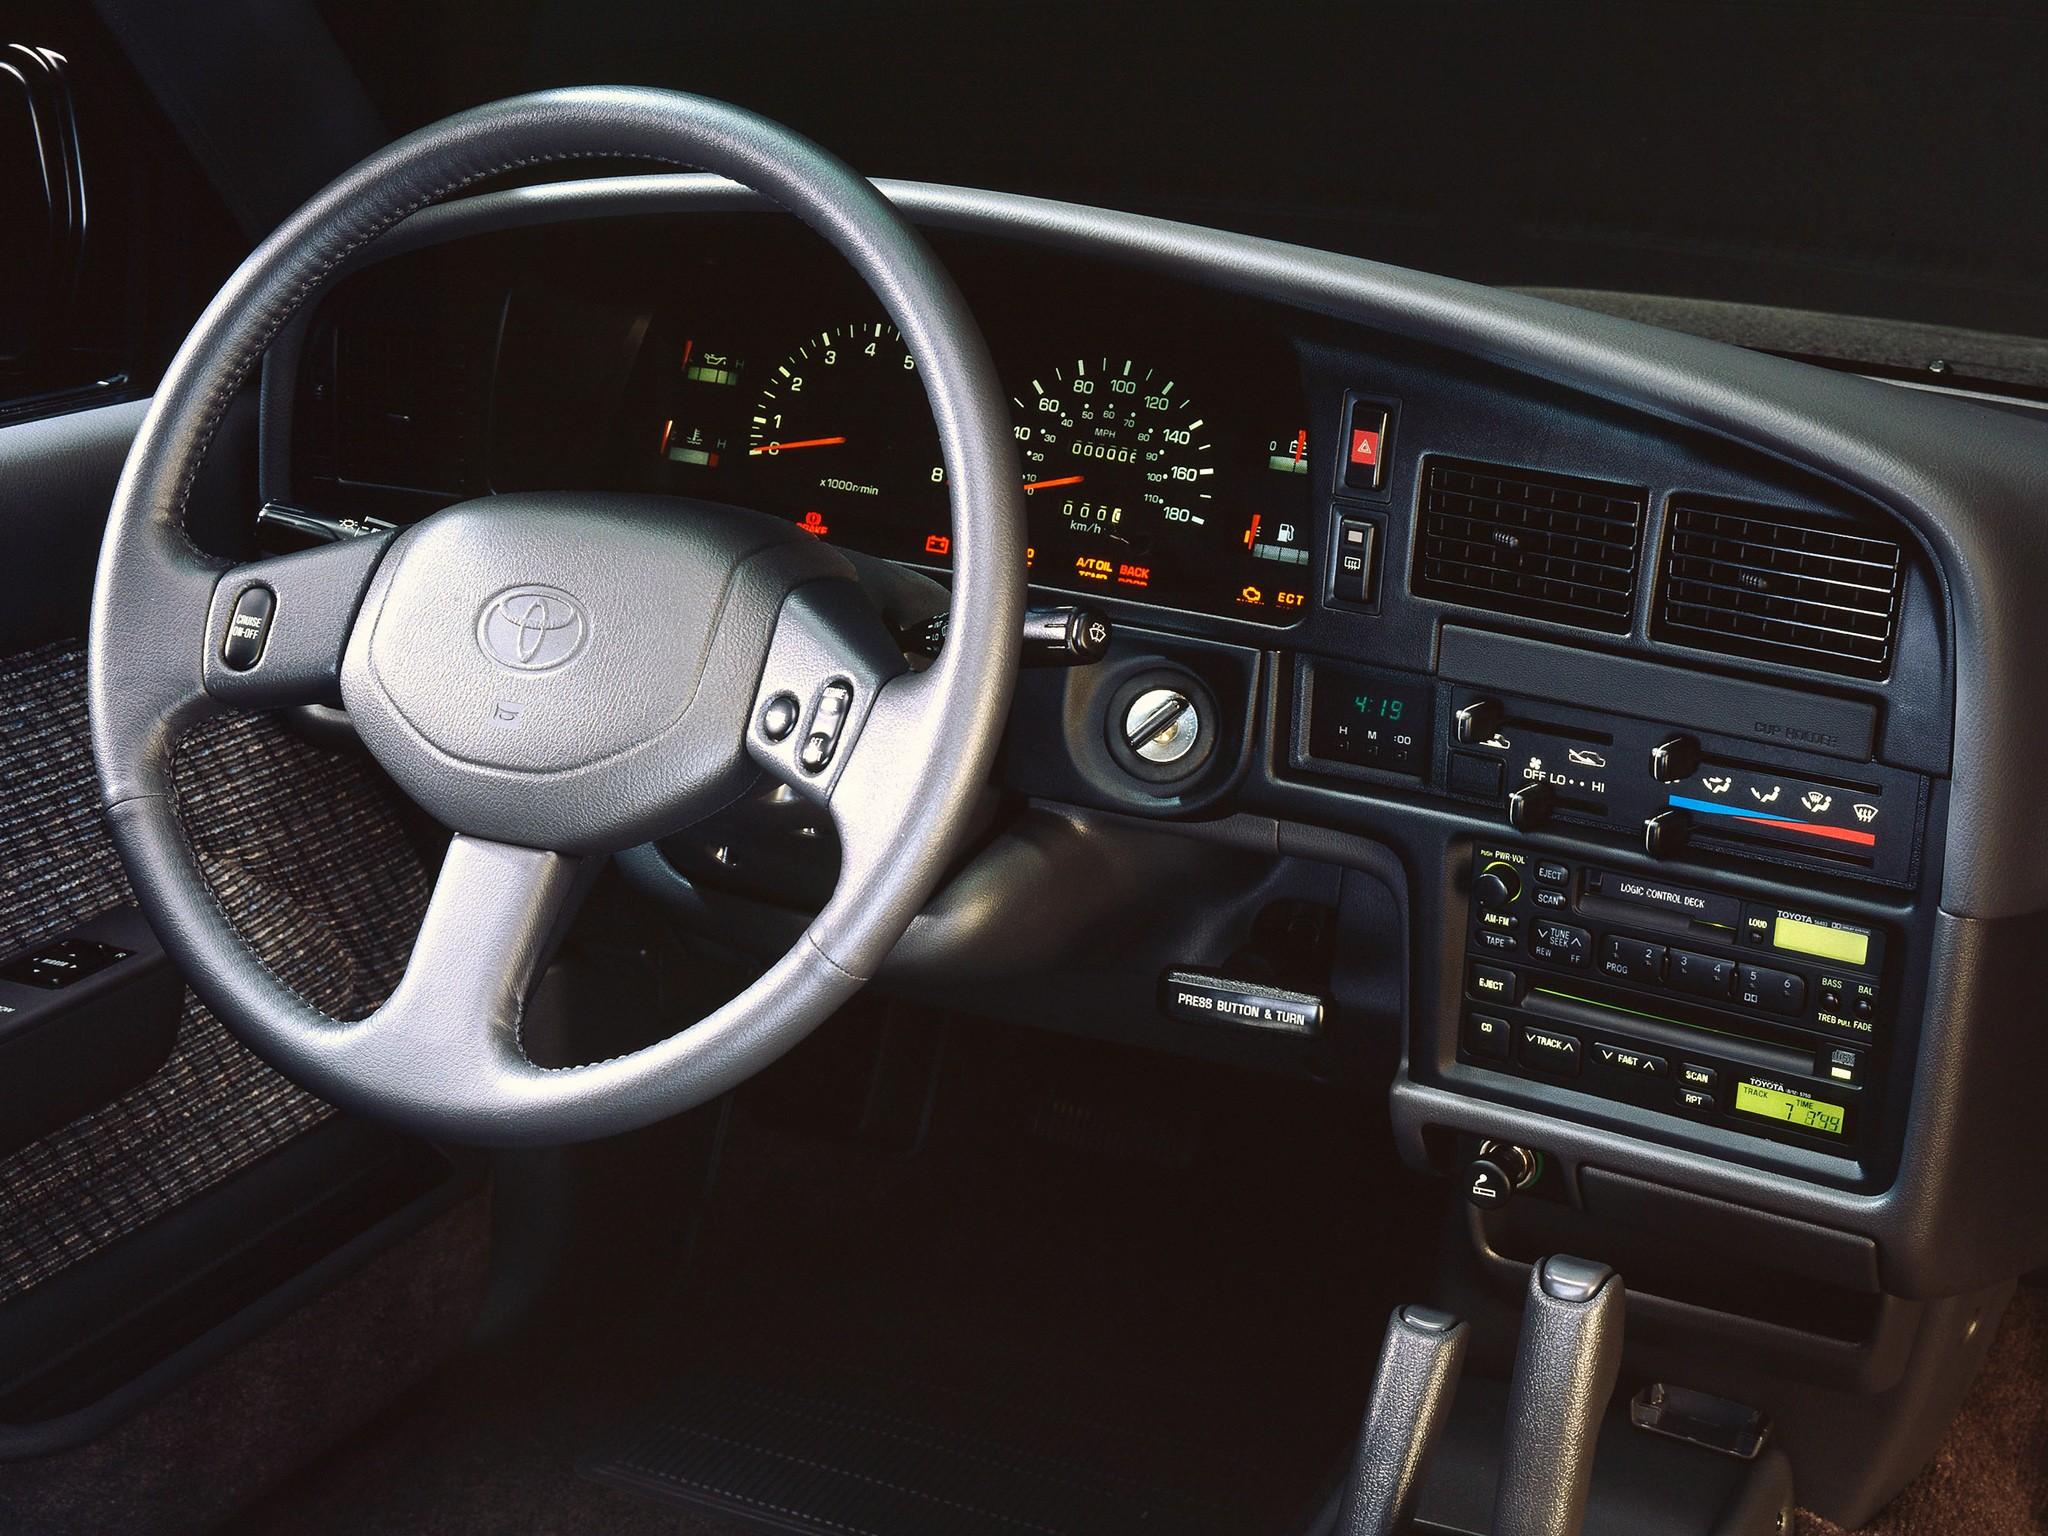 Toyota 4runner 1990 moreover 1992 00 Mitsubishi Montero moreover 2002 Toyota Camry Le 4 additionally Chevrolet Impala 1999 besides 272263355702. on gmc 4 3 v6 engine